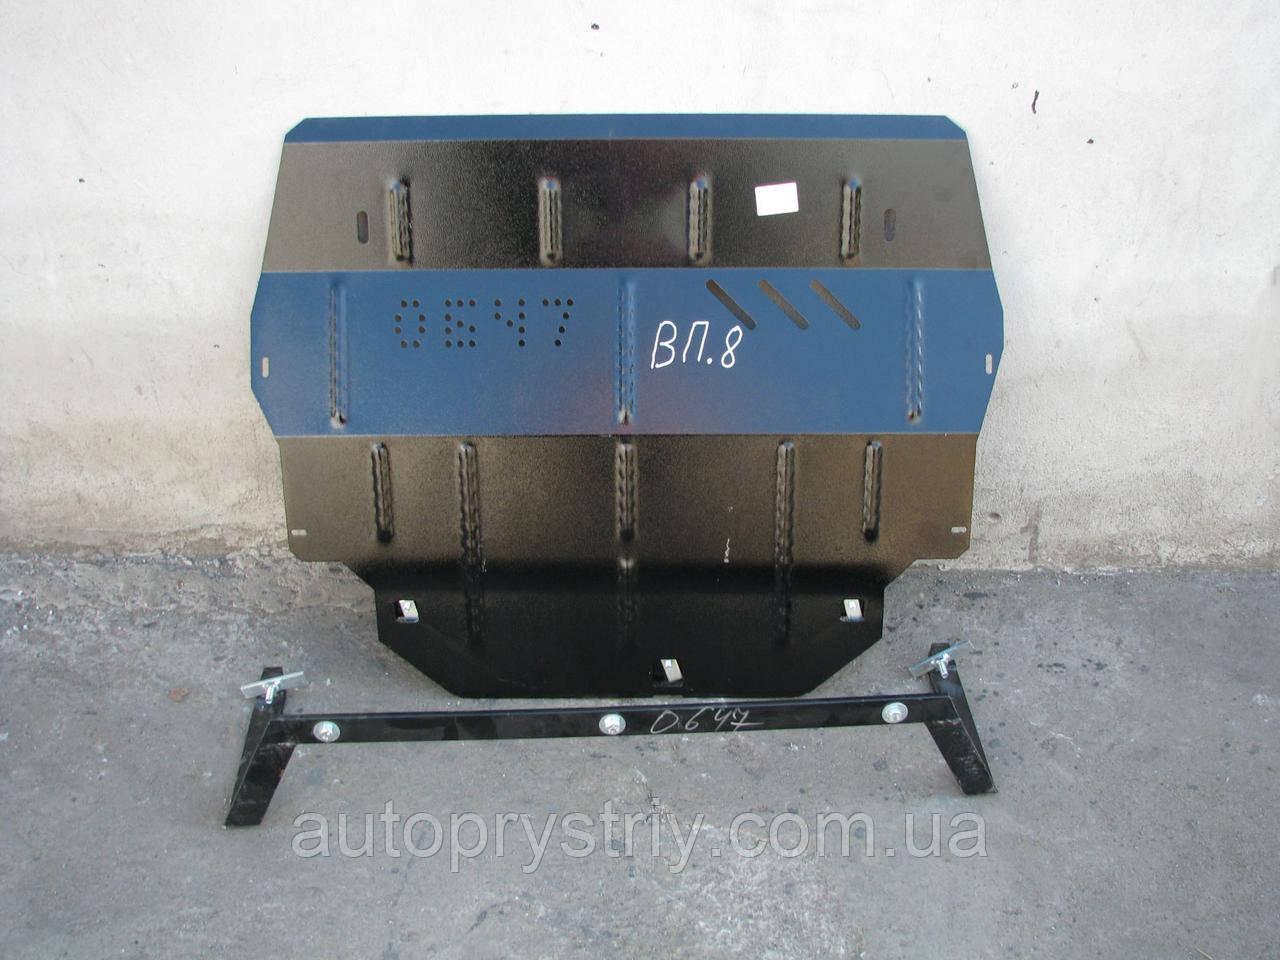 Захист двигуна і КПП Volkswagen Polo седан 5 (2009--) 1.2 D, 1.6 i